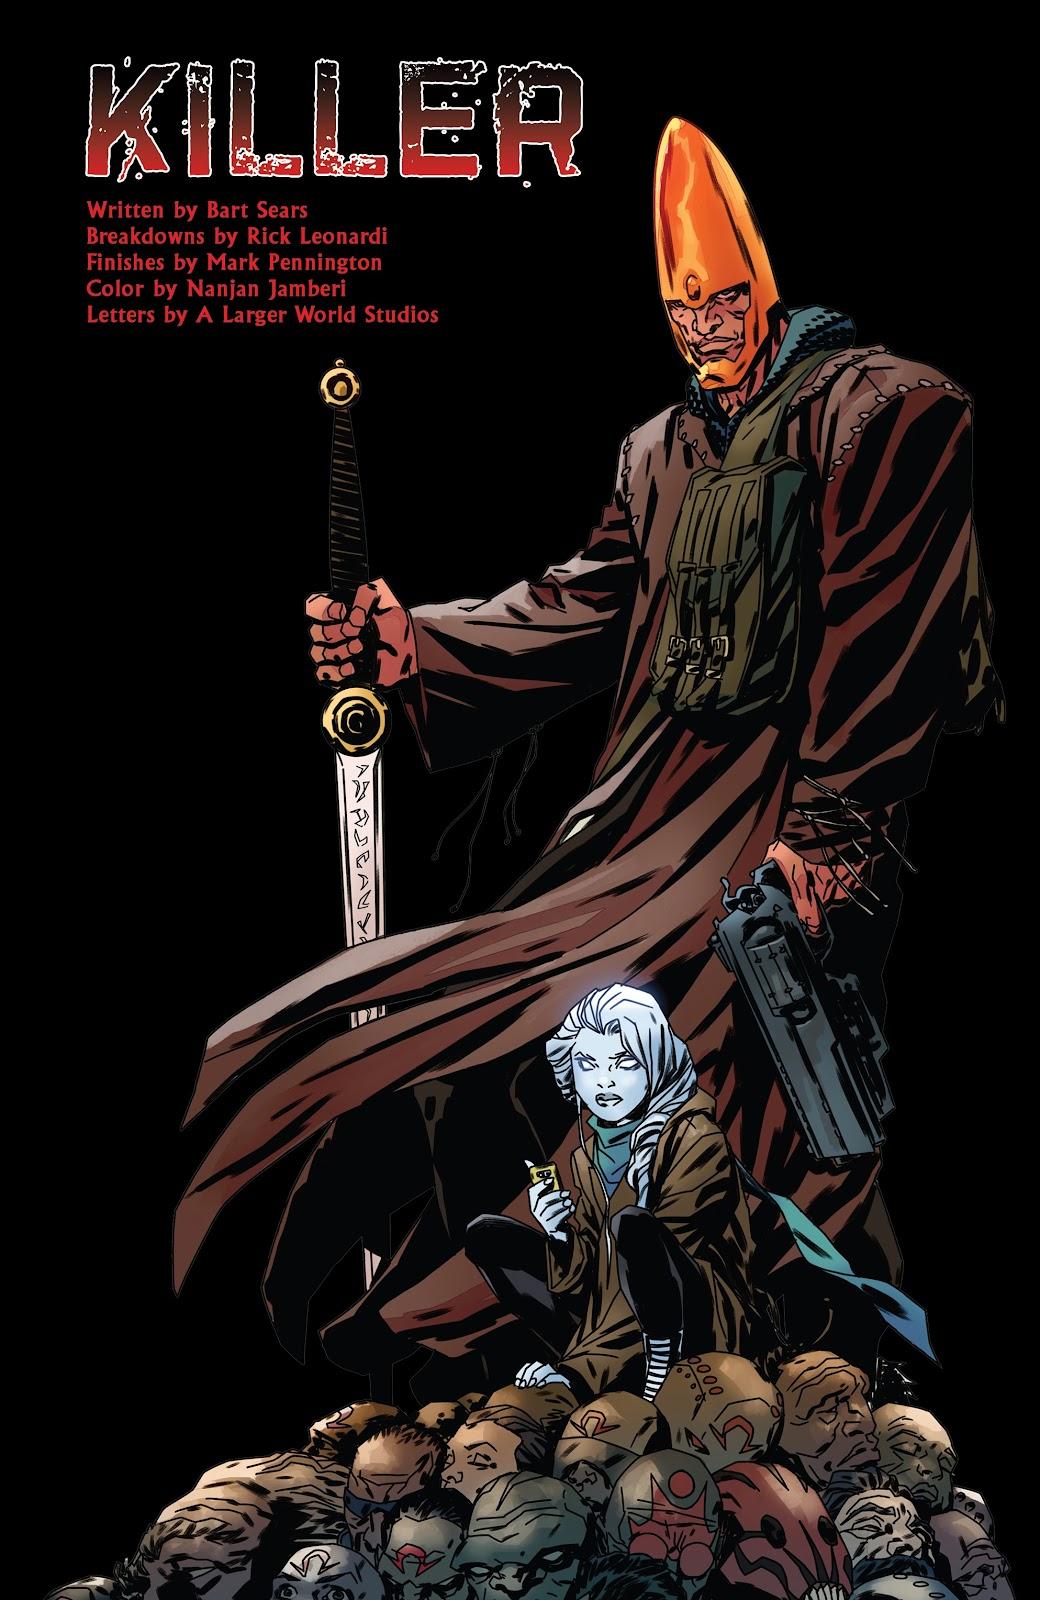 Read online Giantkillers One-Shot comic -  Issue # Full - 3